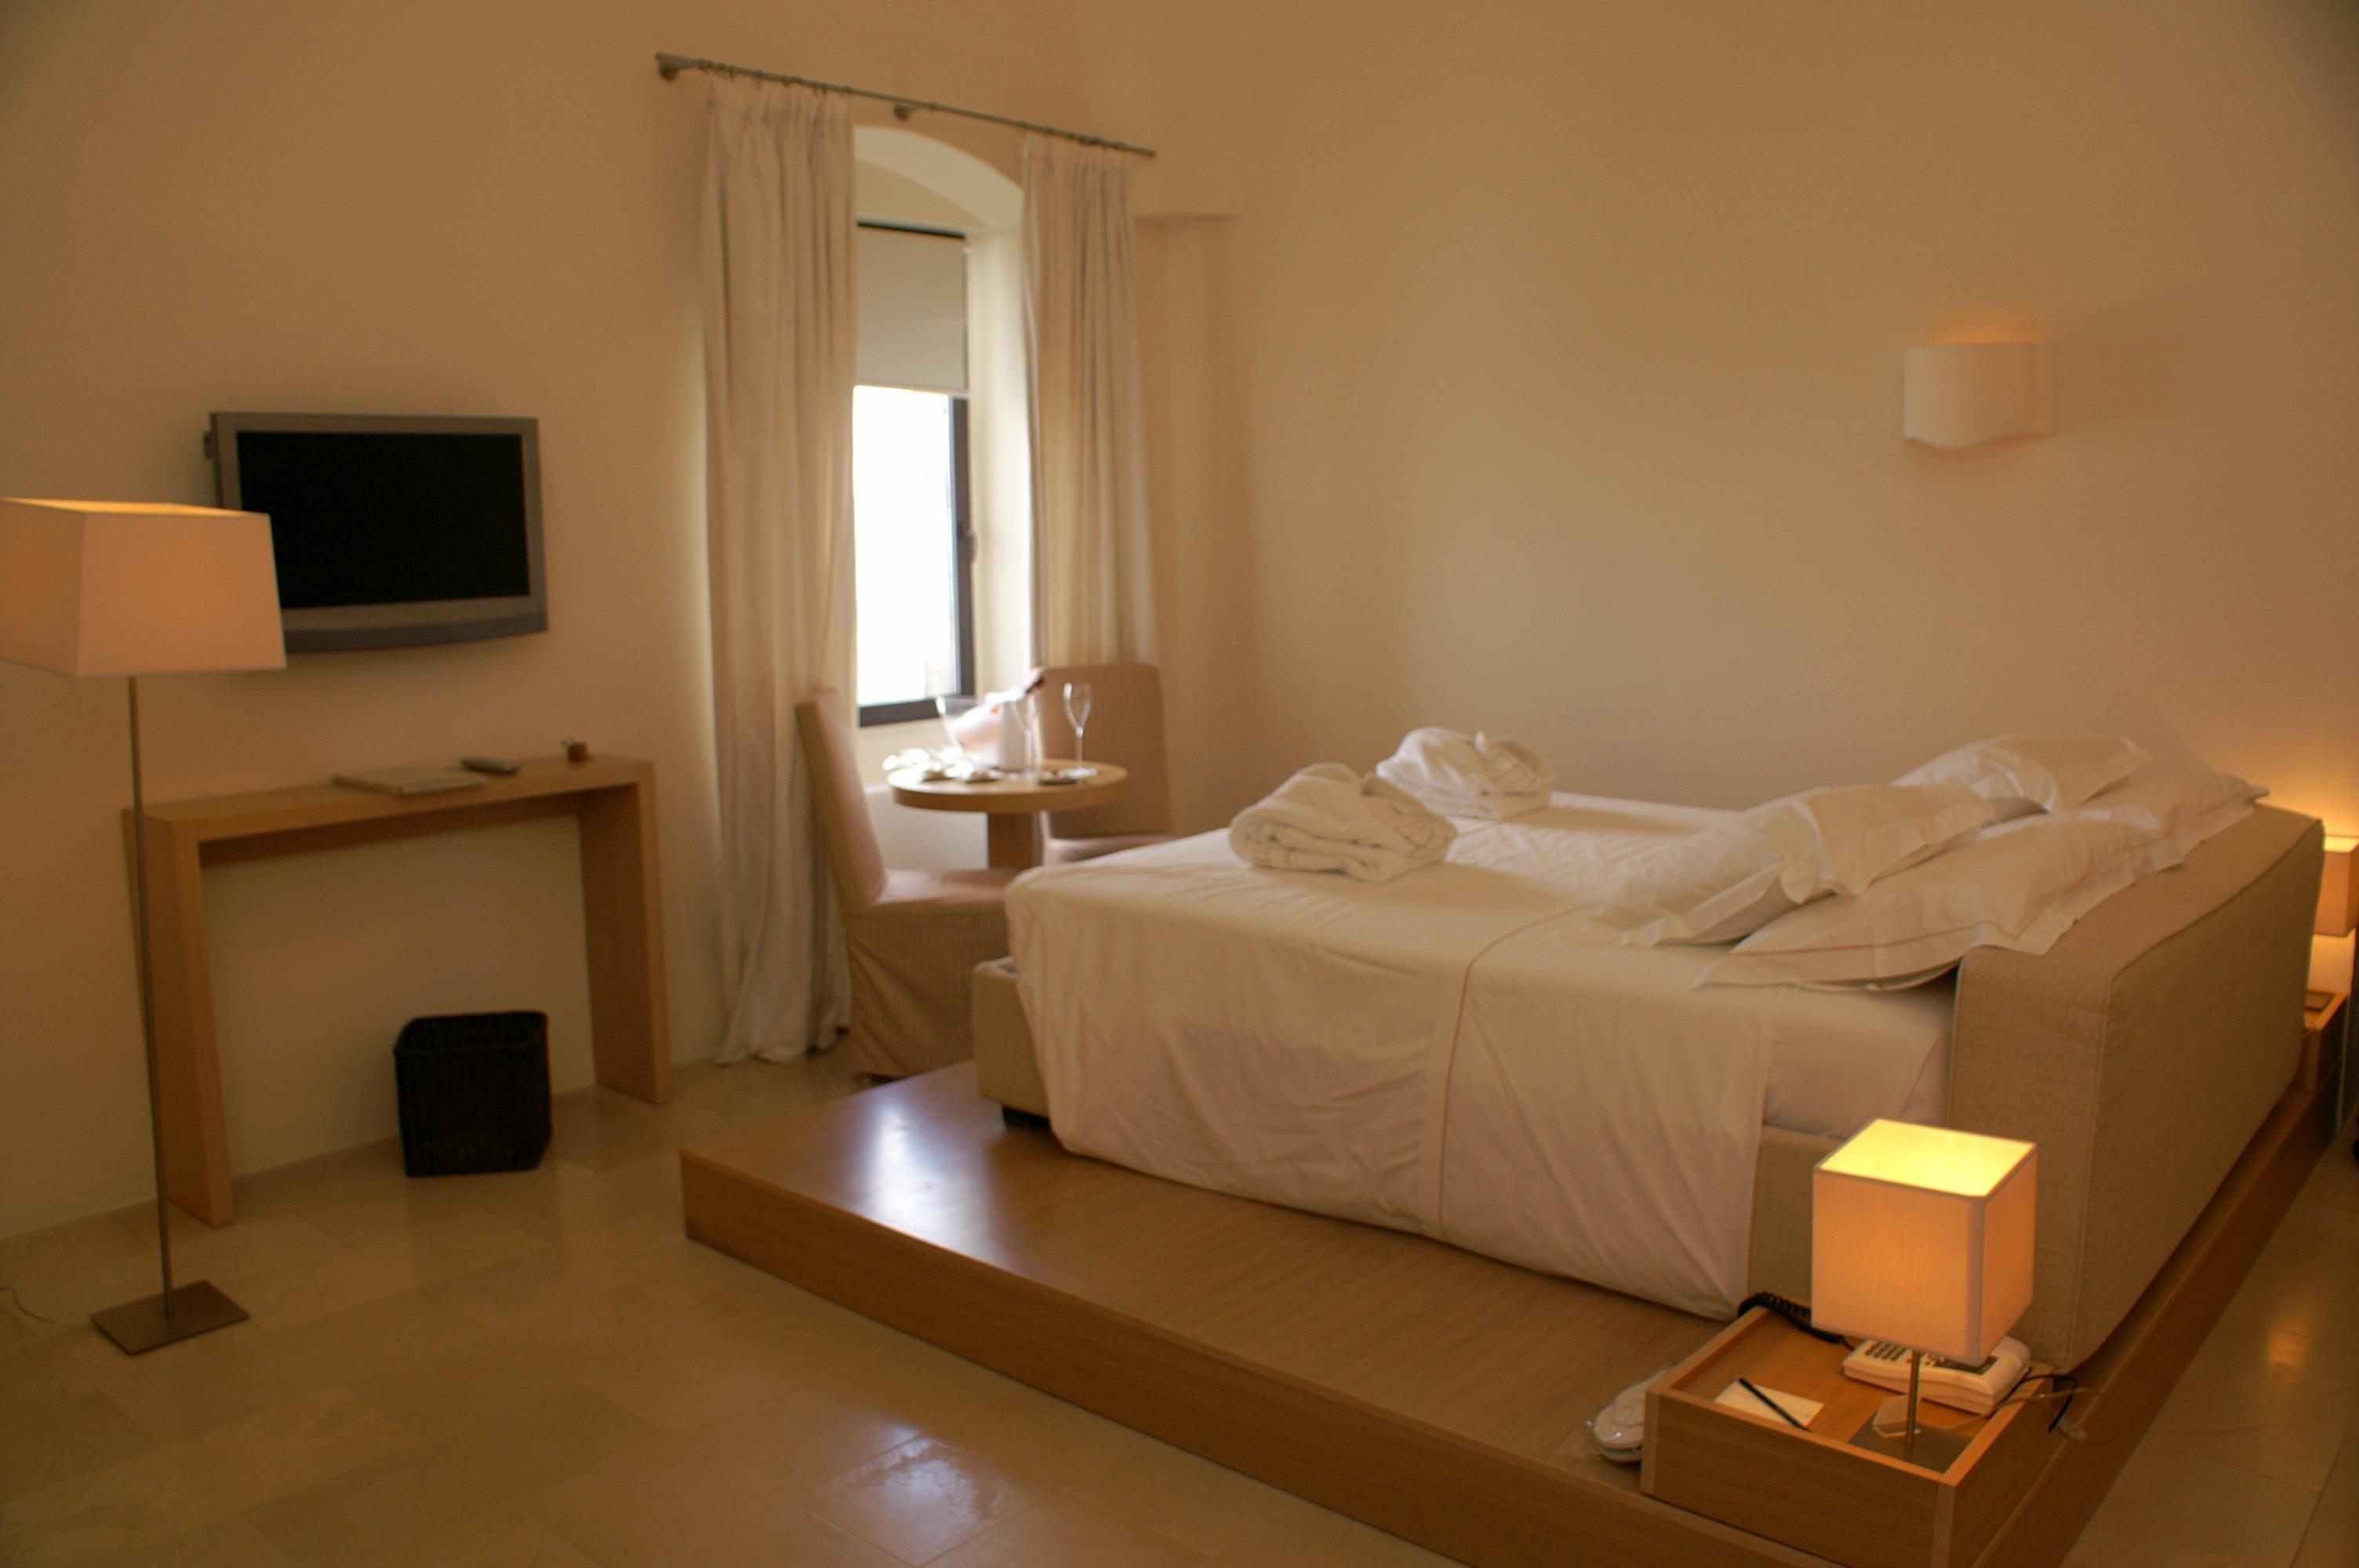 Bed in La Sommita Relais hotel room in Ostuni, Puglia, Italy